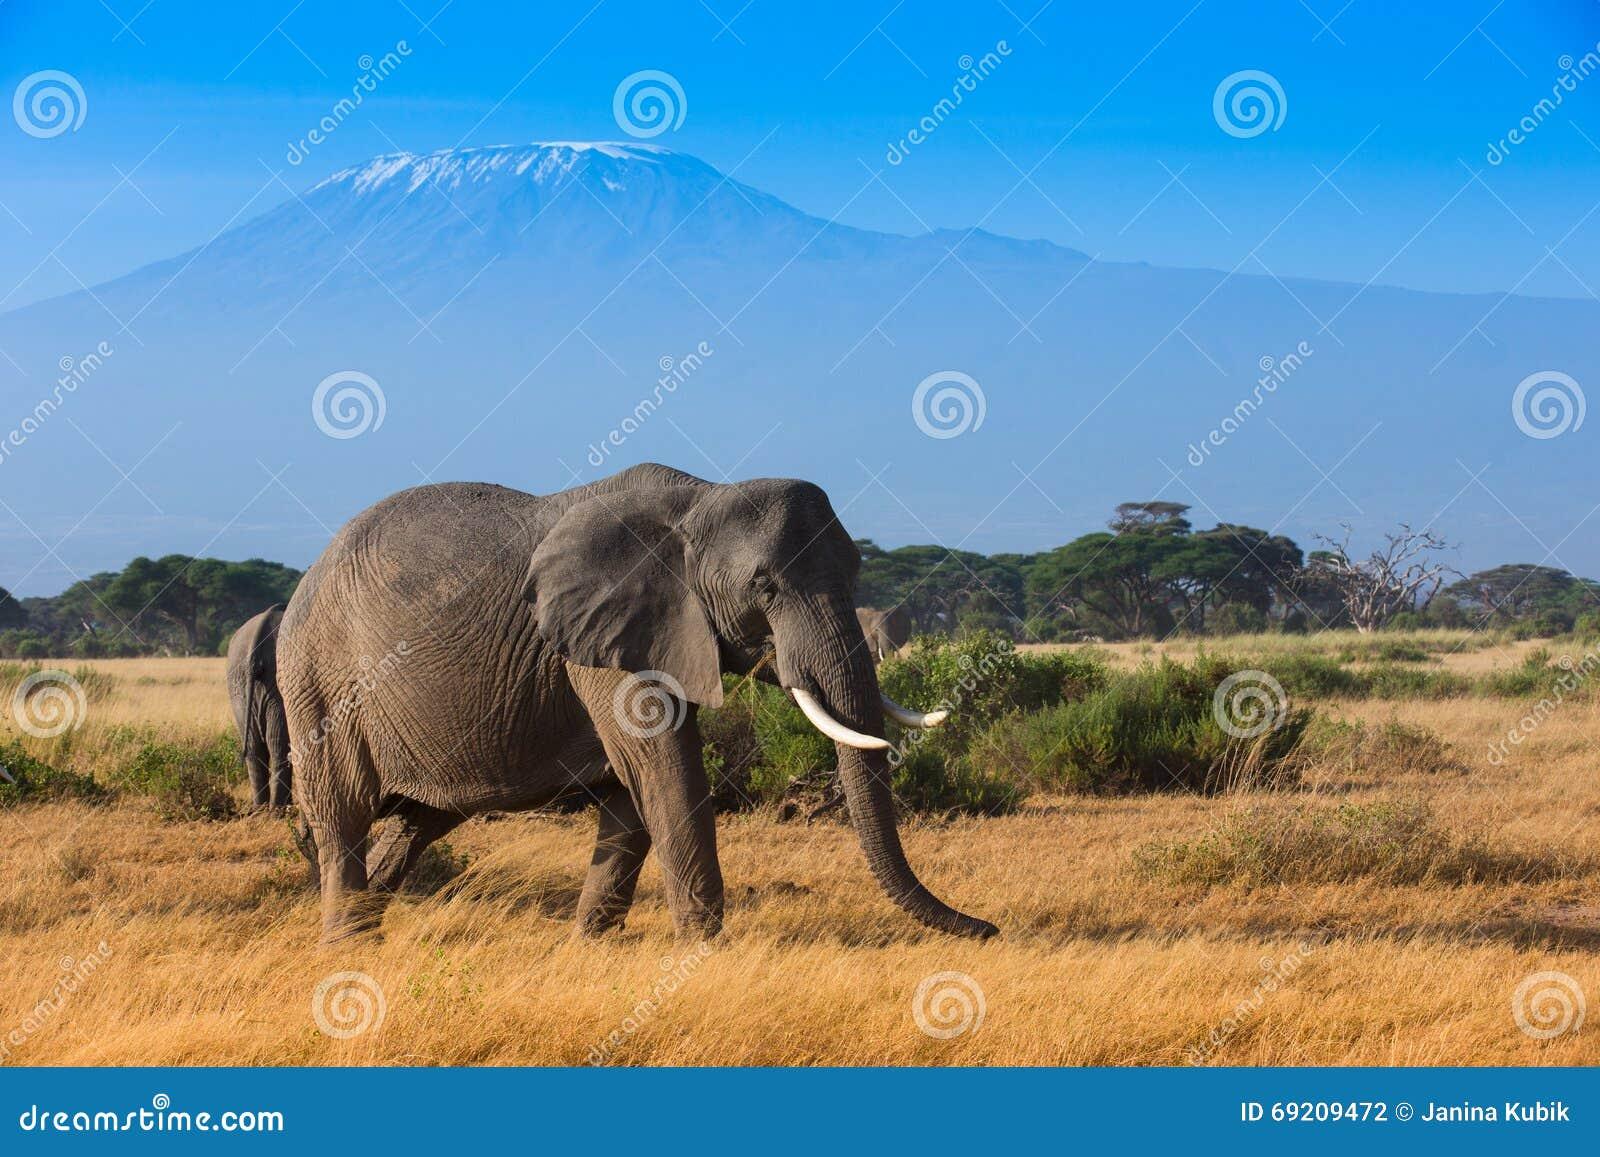 African Mountain Animals - African animals kilimanjaro landscape mountain